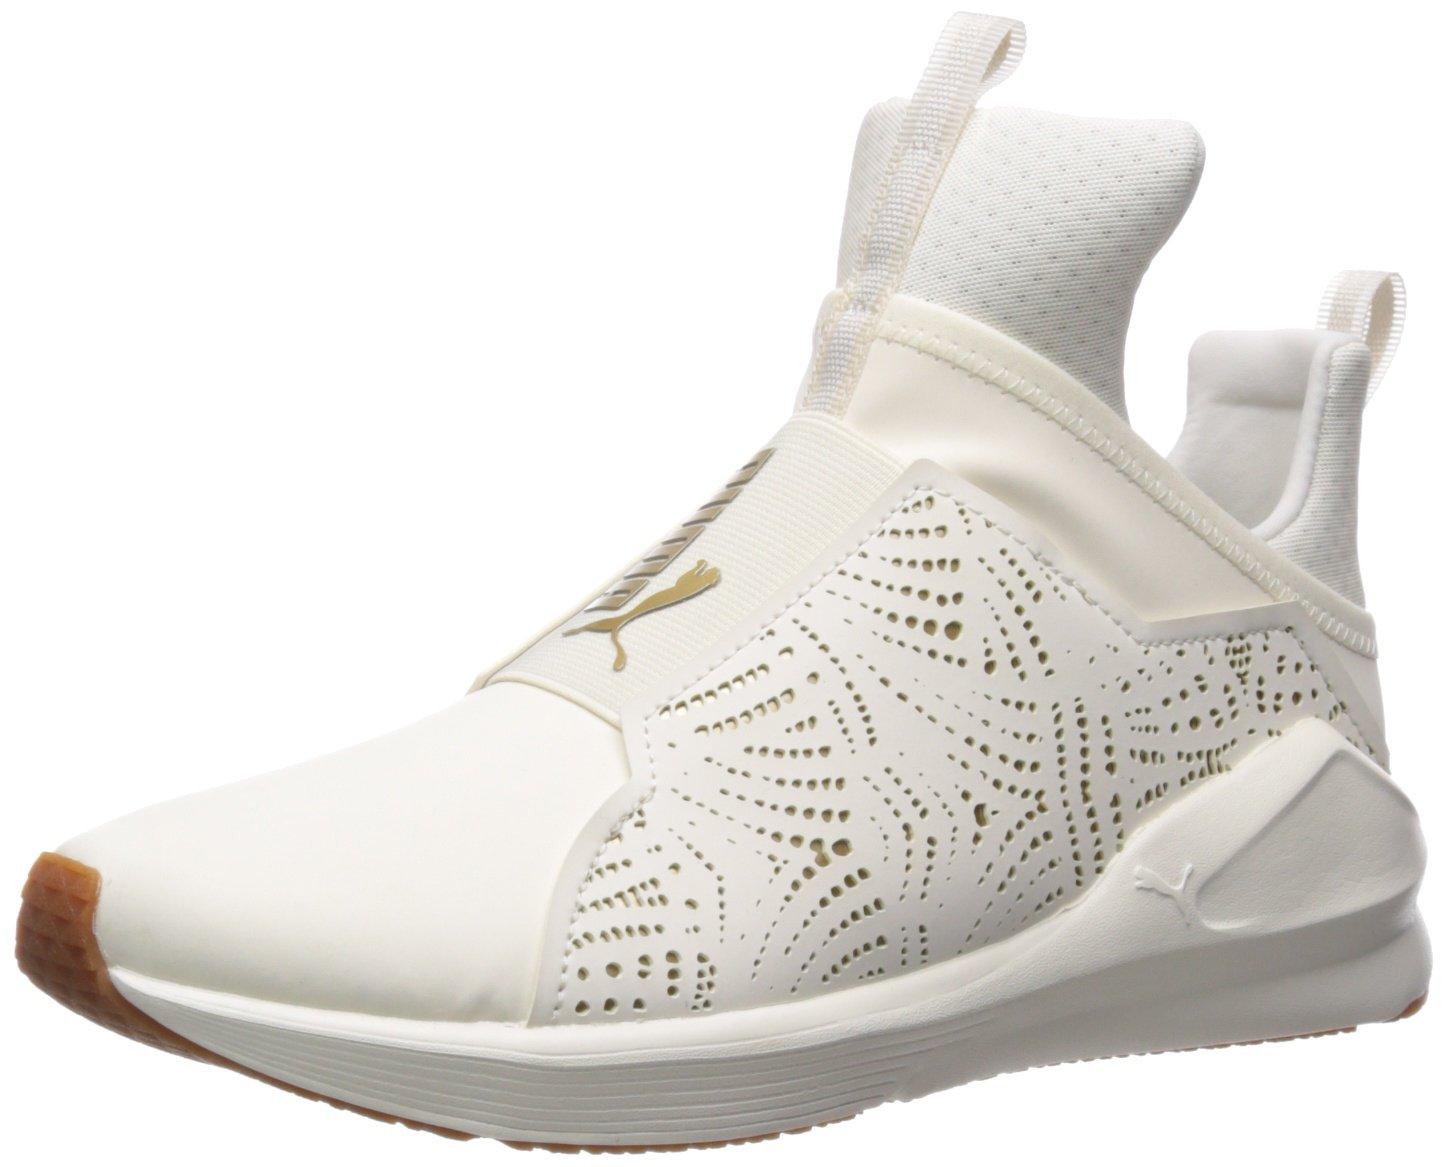 PUMA Women's Fierce Lasercut Wn Sneaker B0721KD1TL 8.5 B(M) US|Whisper White-gold